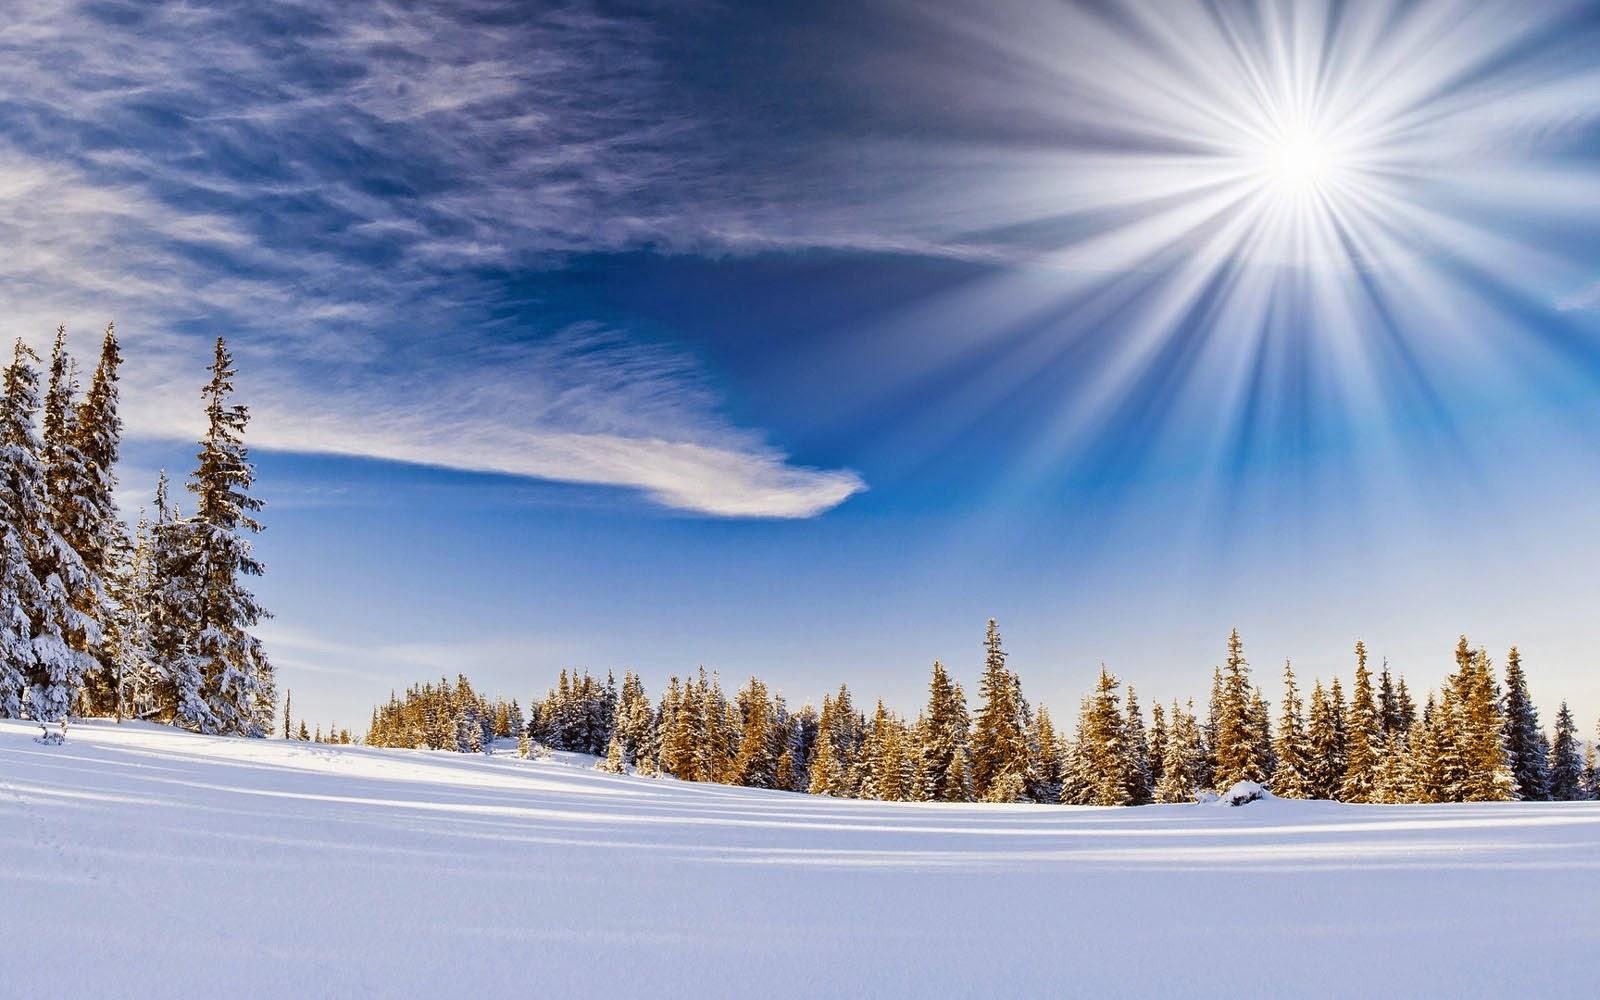 wallpapers: Winter Wallpapers